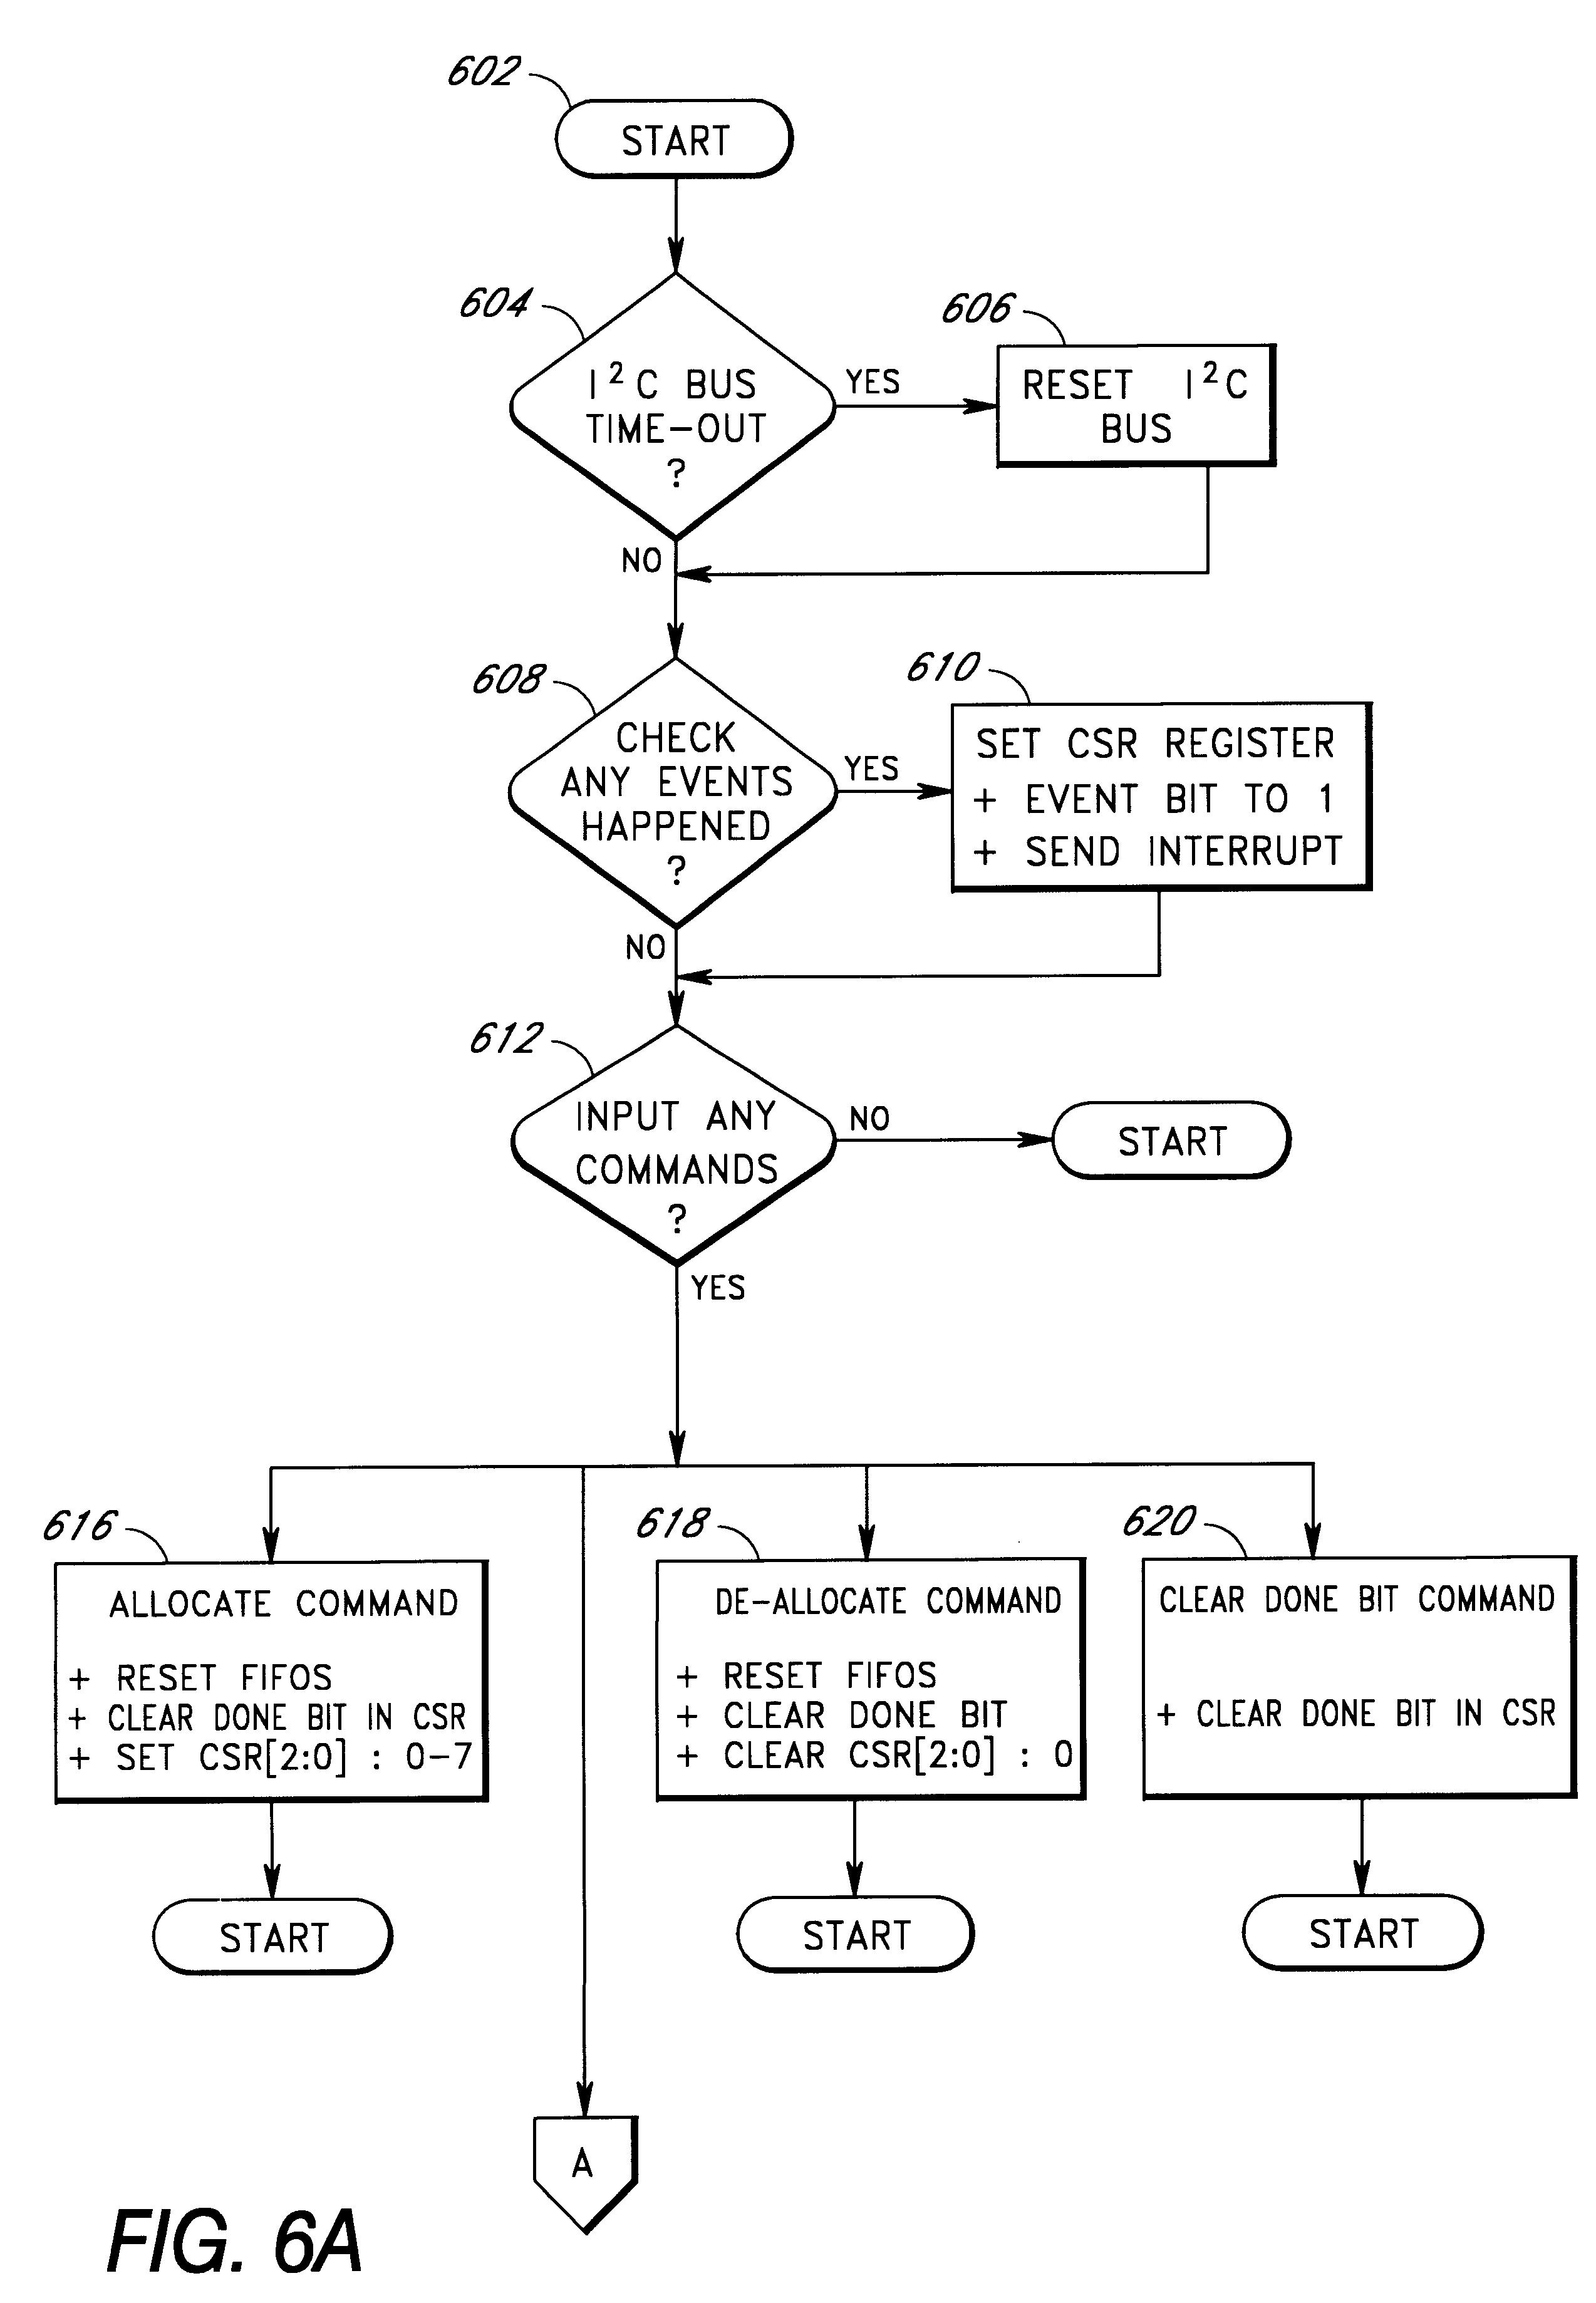 Patent US 6,341,322 B1